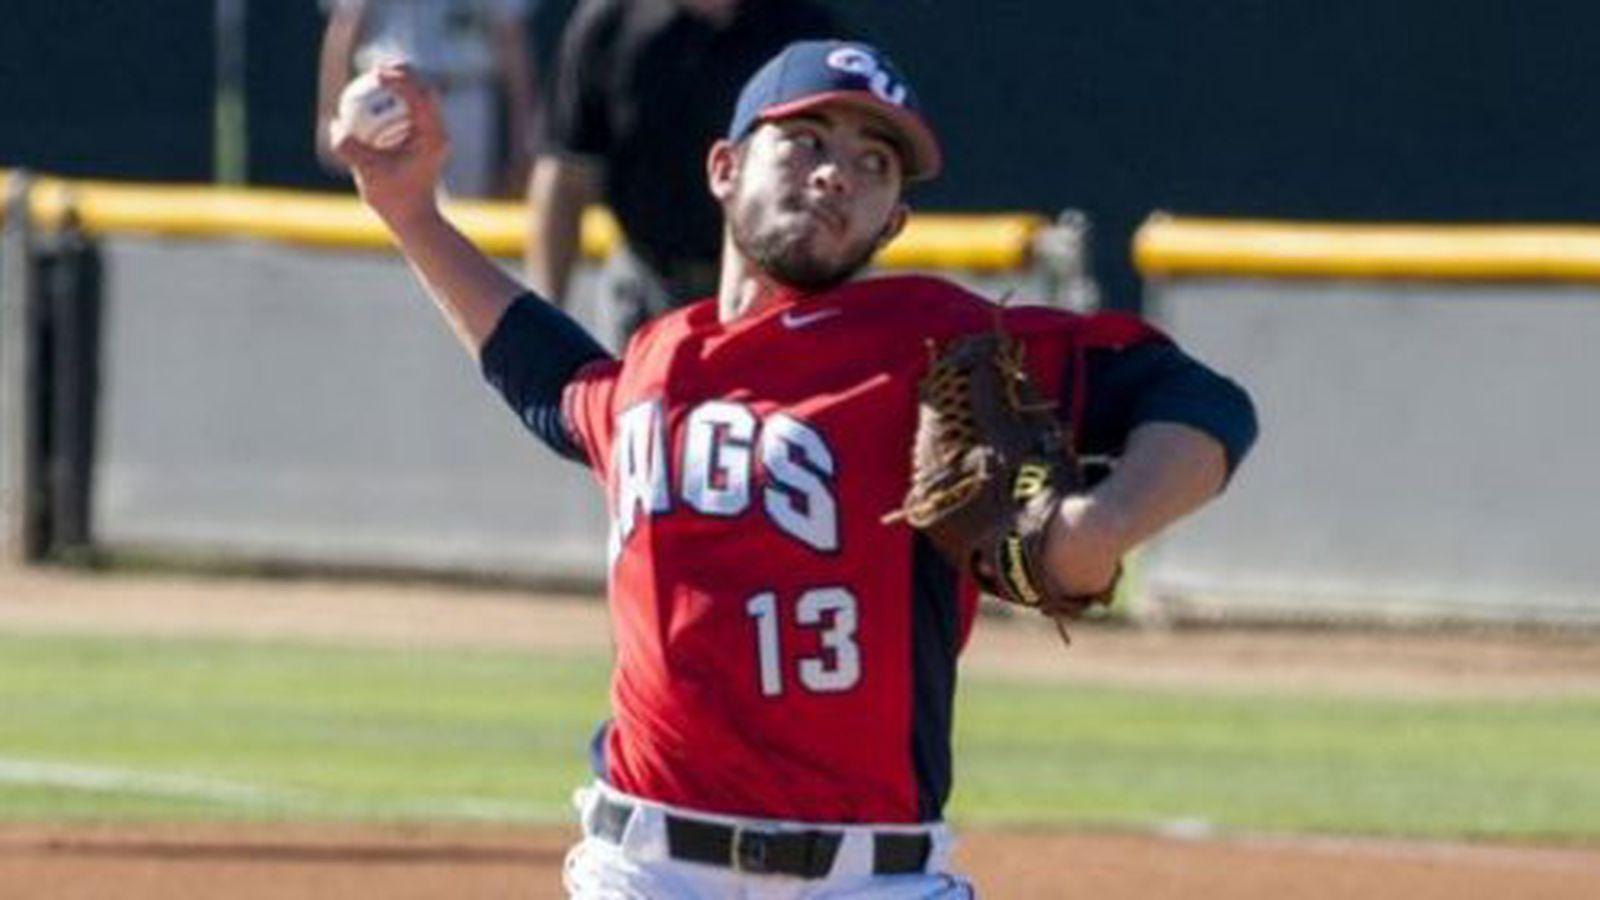 Zags_pitcher_wins_777.0